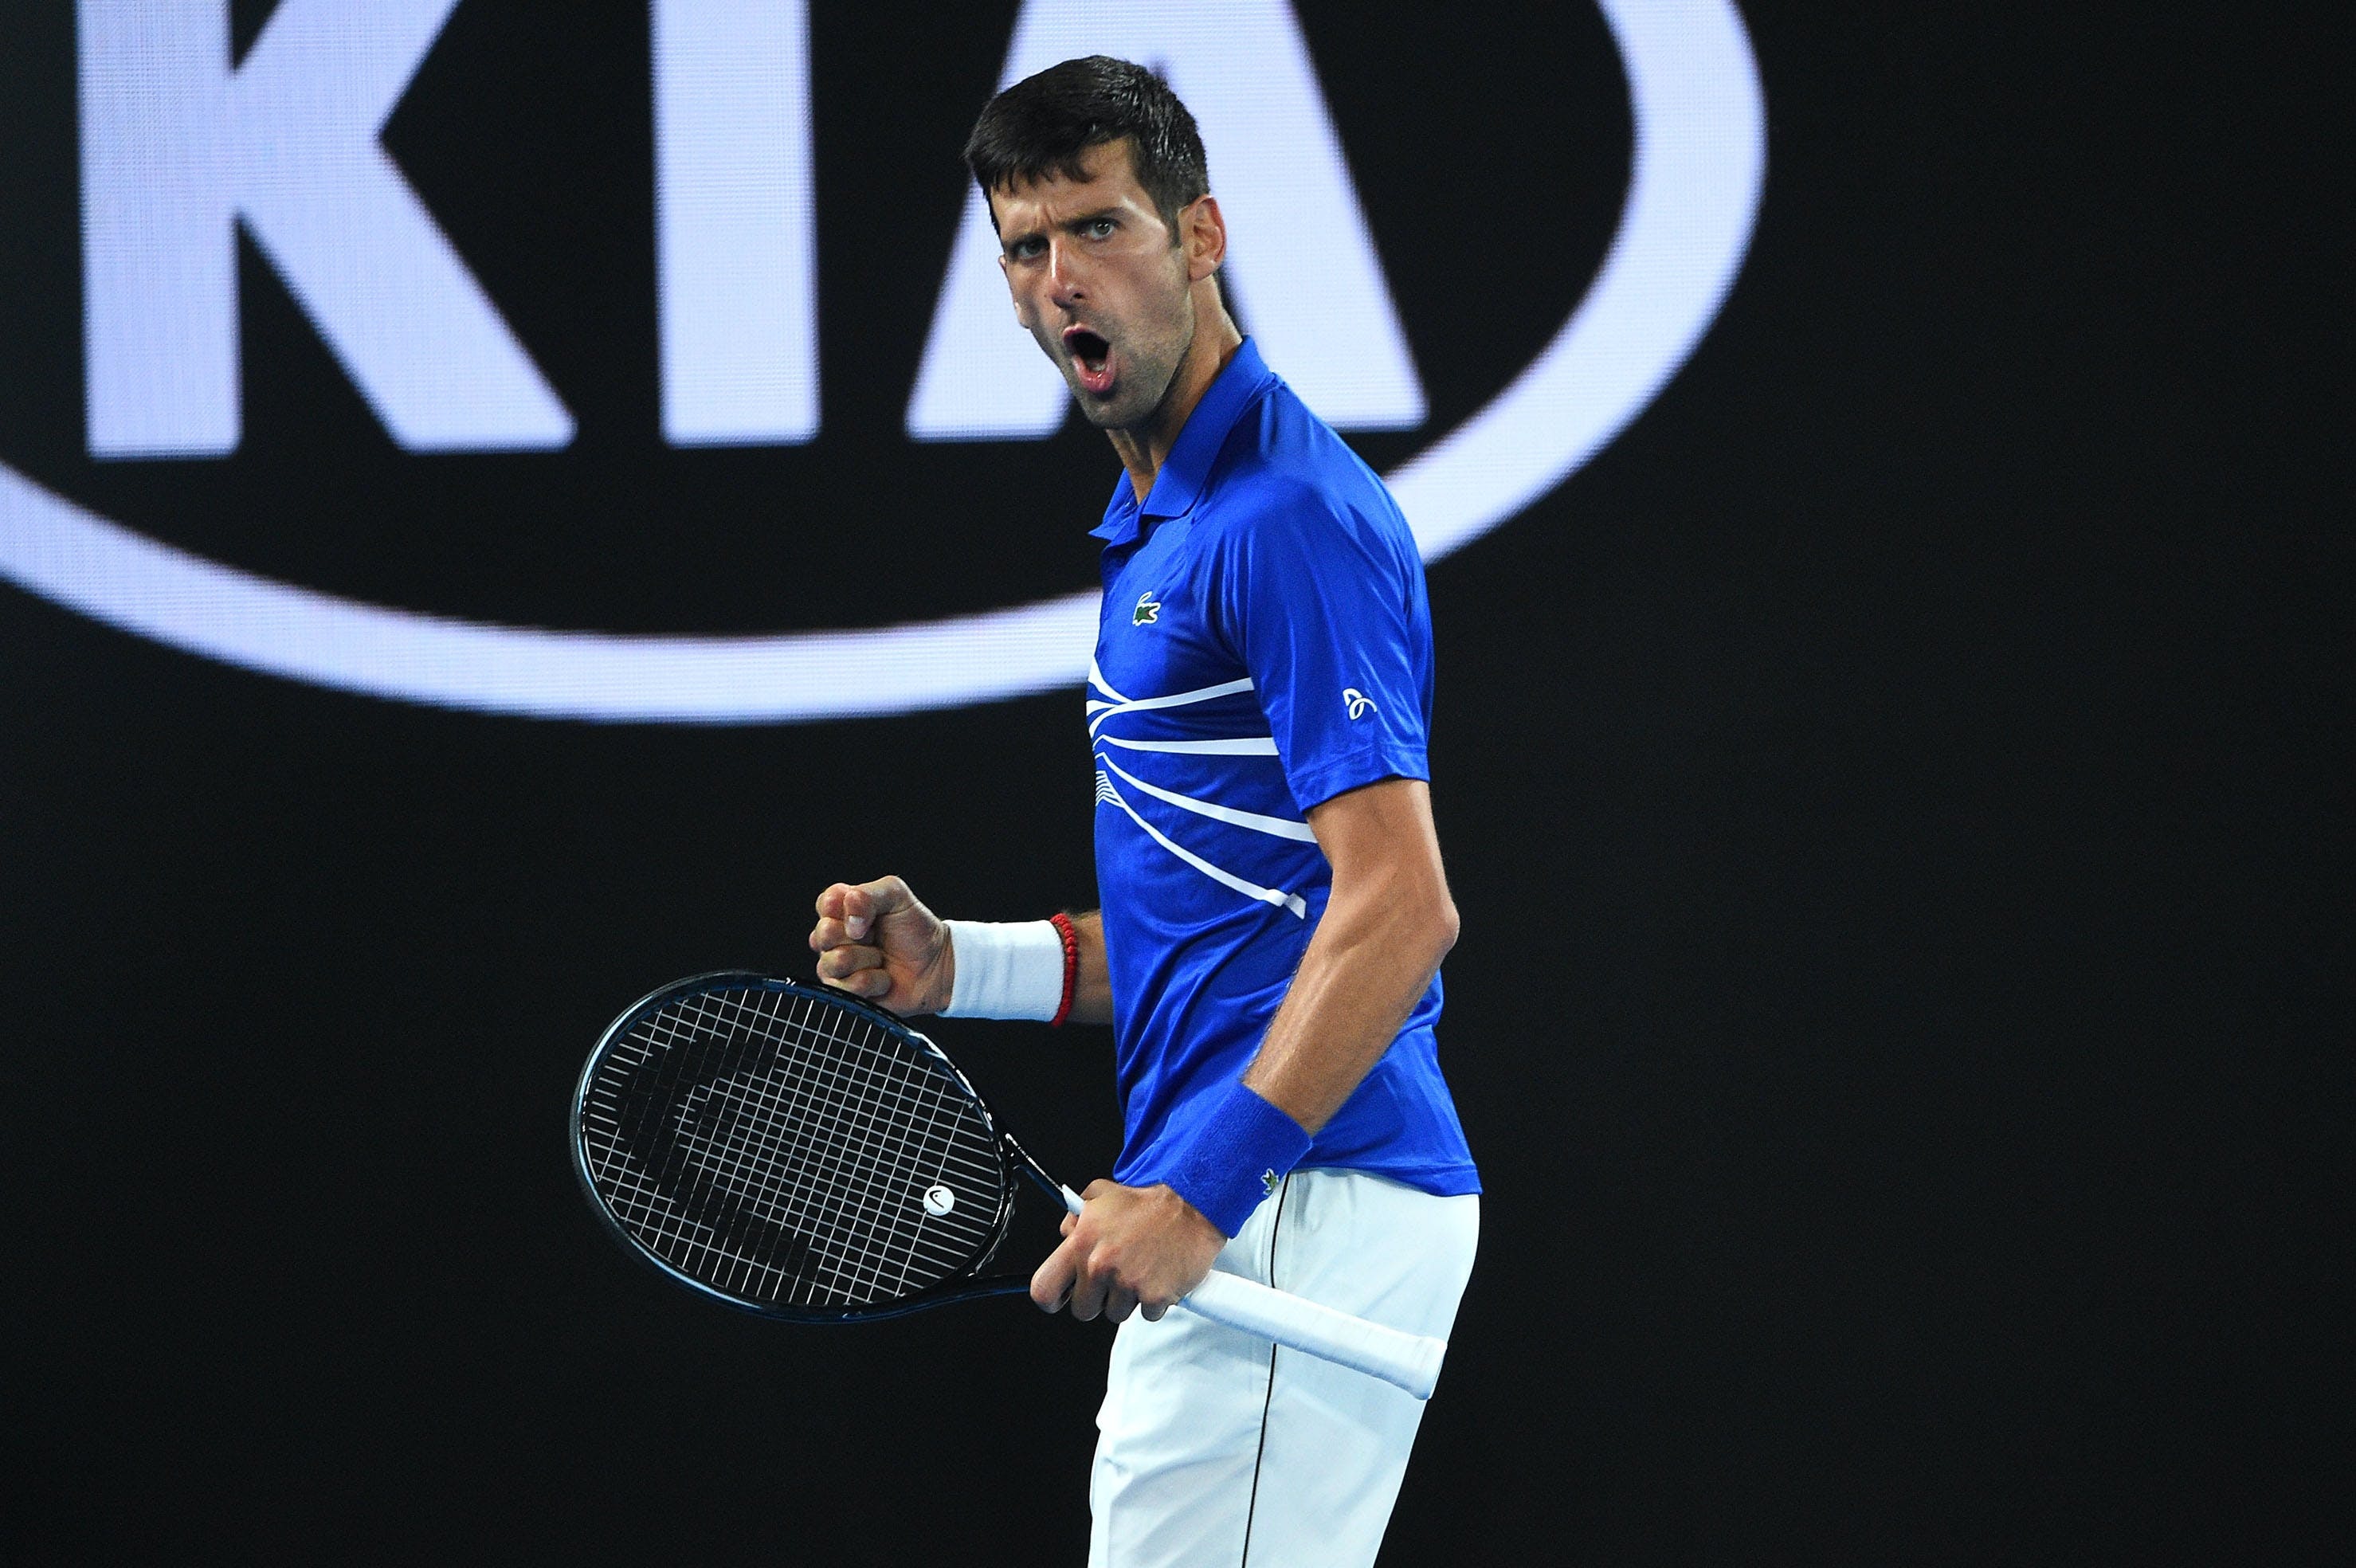 Impressive Novak Djokovic during his semifinal against Lucas Pouille at the 2019 Australia Open